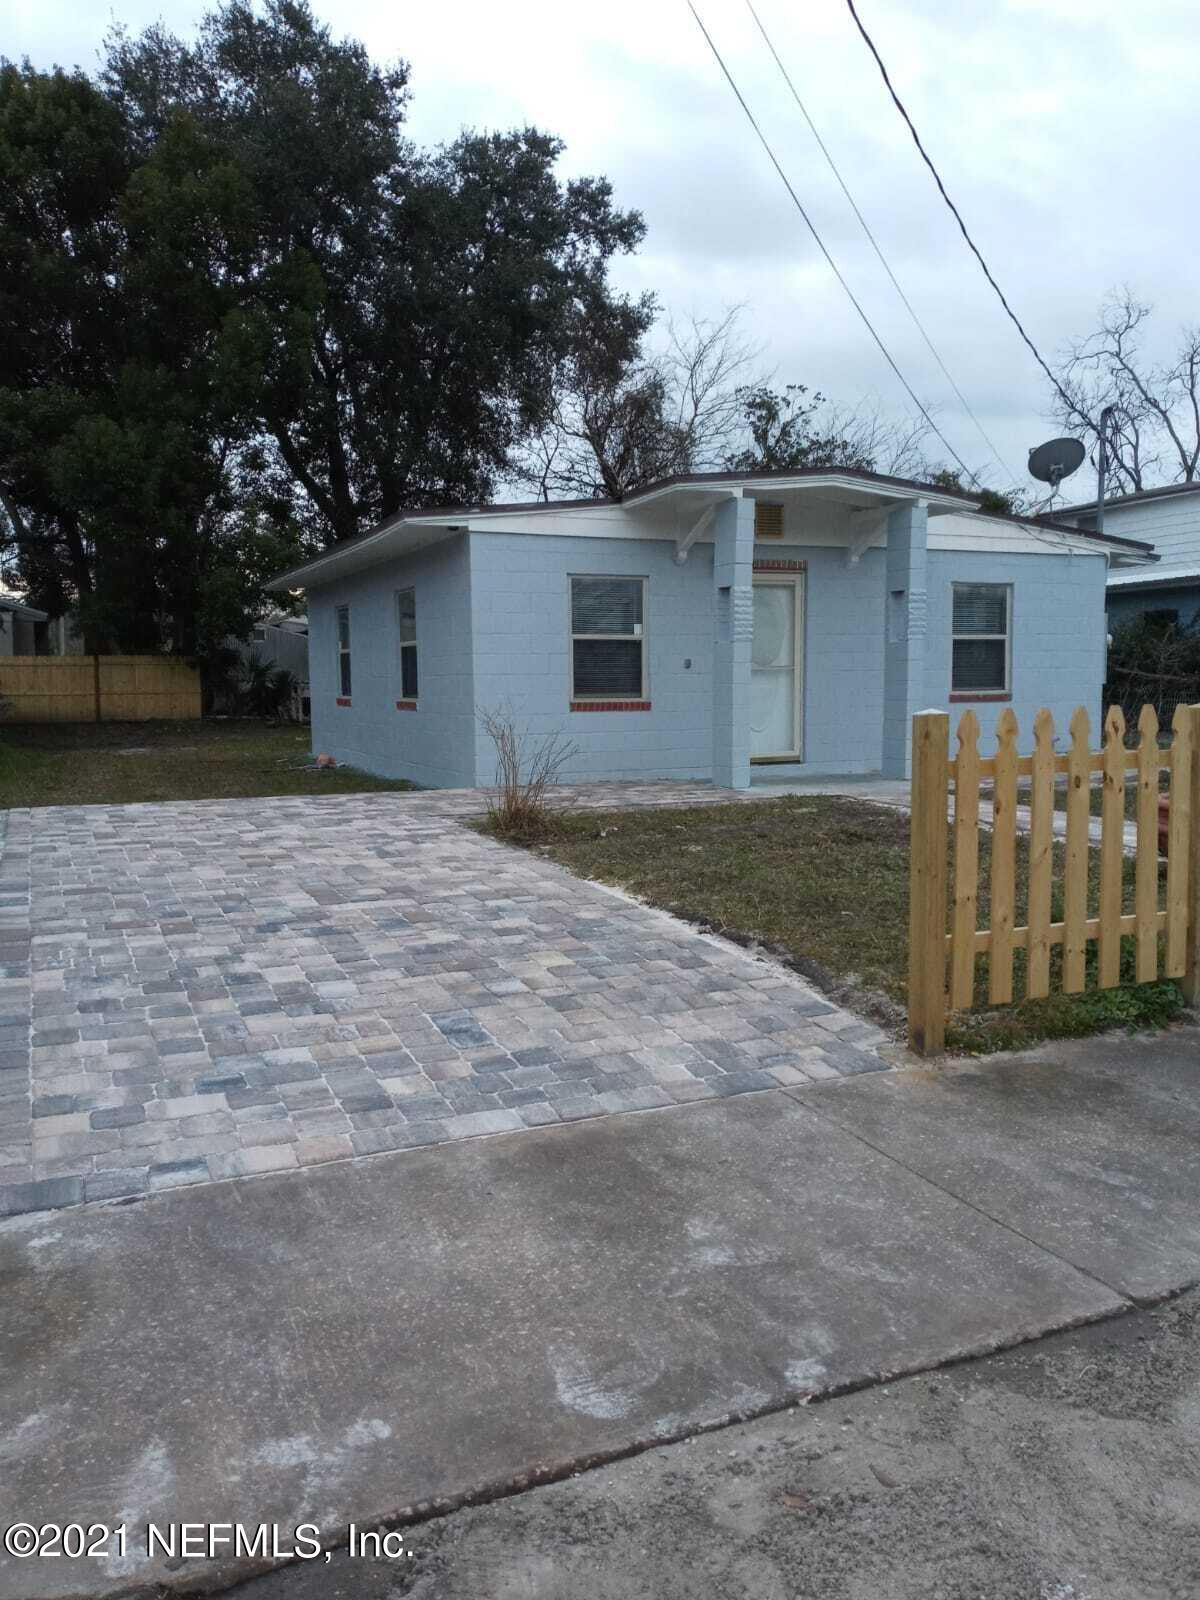 1142 W 31ST ST, JACKSONVILLE, FL 32209